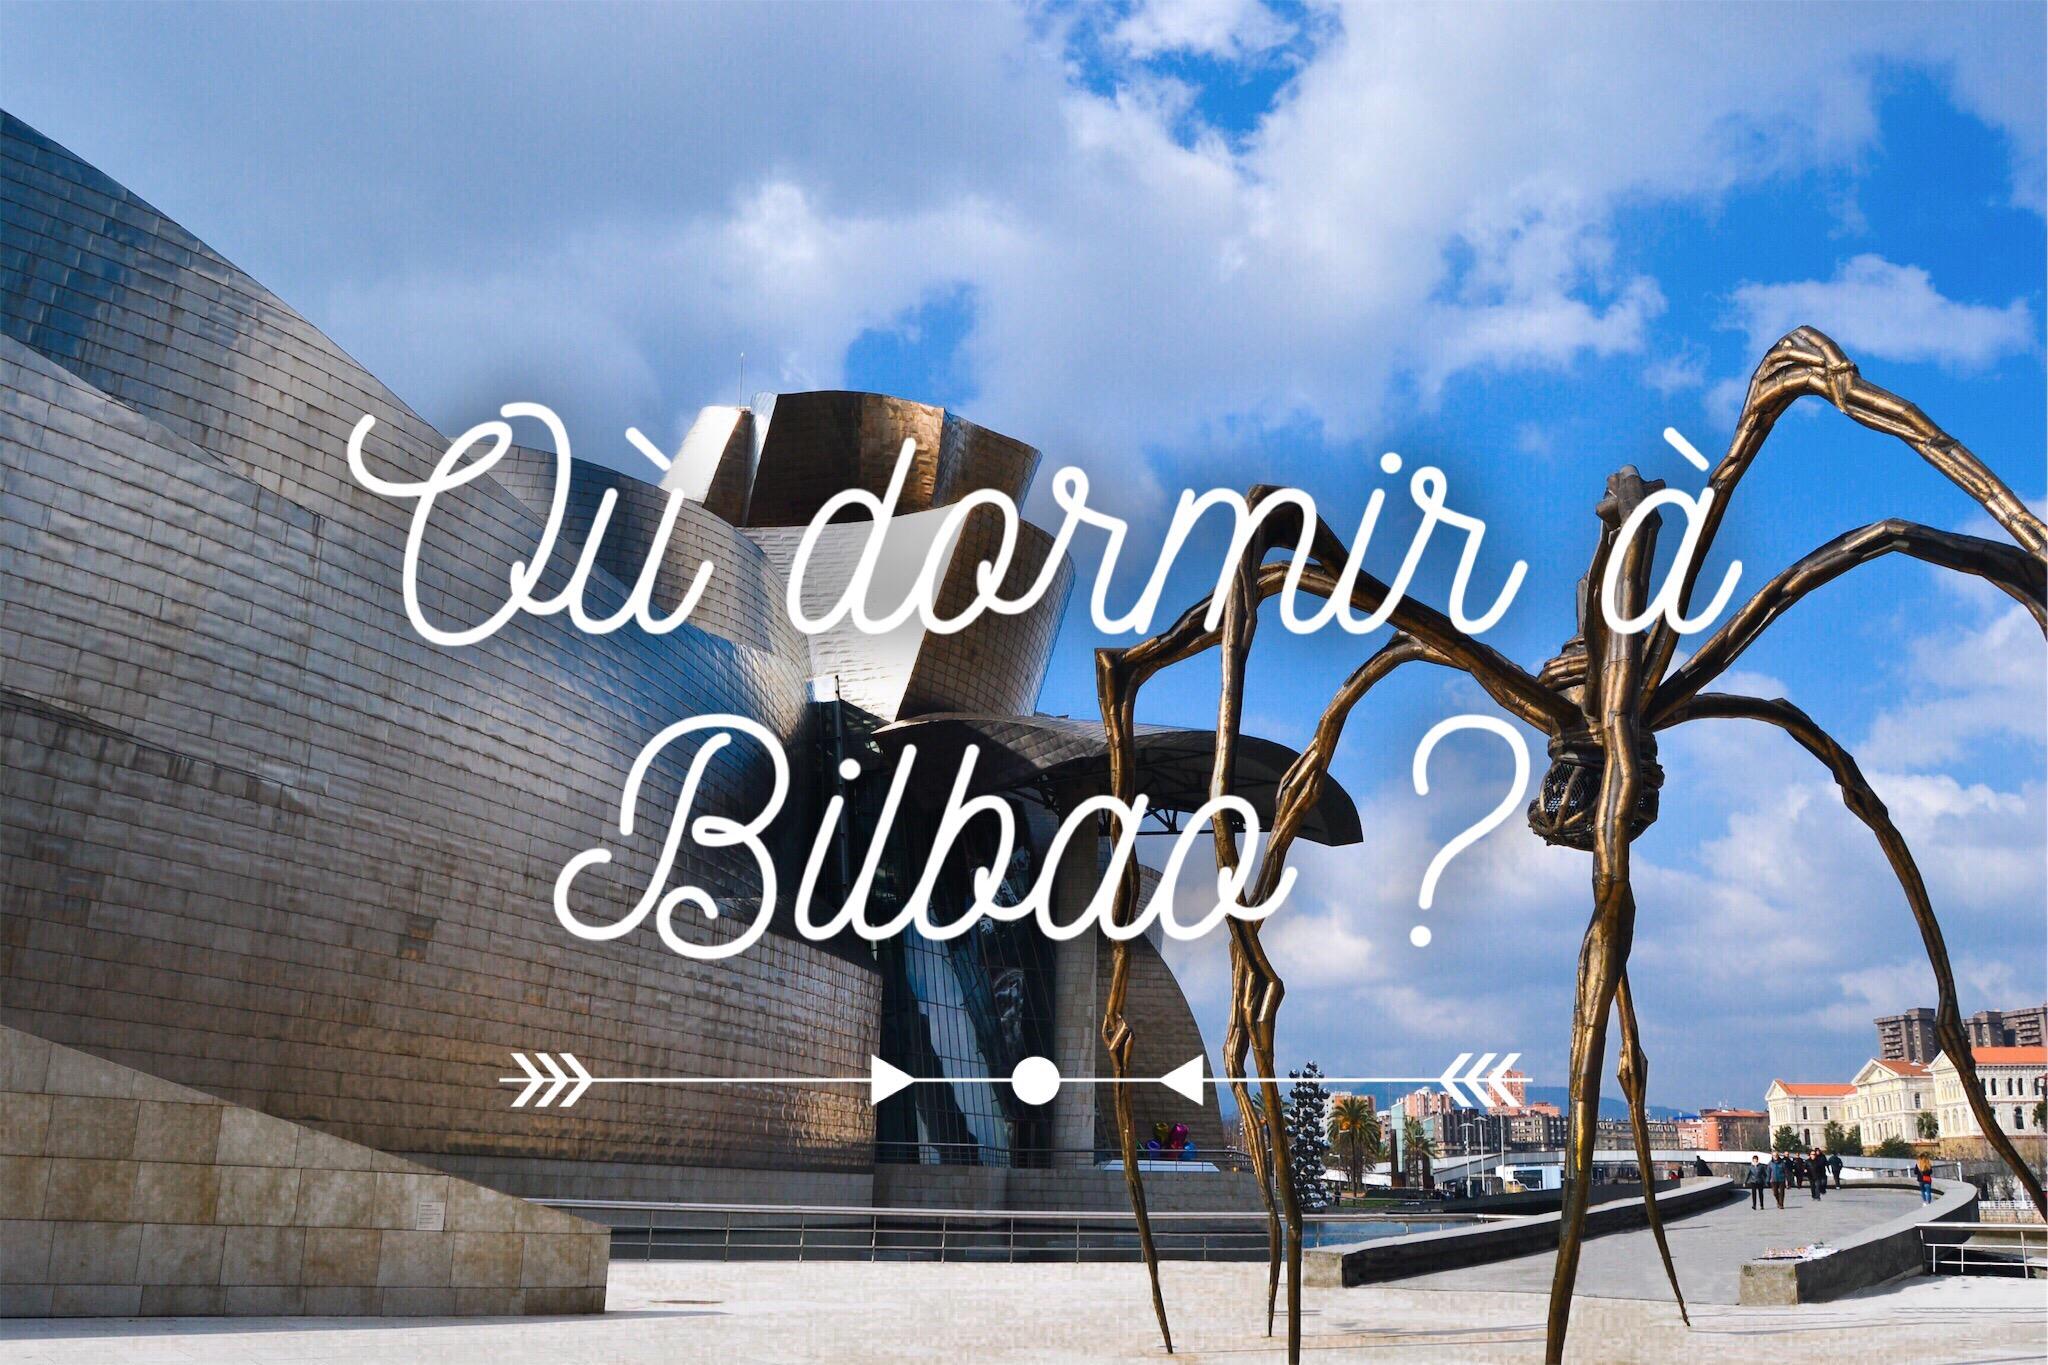 Où dormir à Bilbao ? Hotel Gran Bilbao Où se loger à Bilbao ? Quel hôtel choisir à Bilbao ? Les p'tits touristes Blog voyage